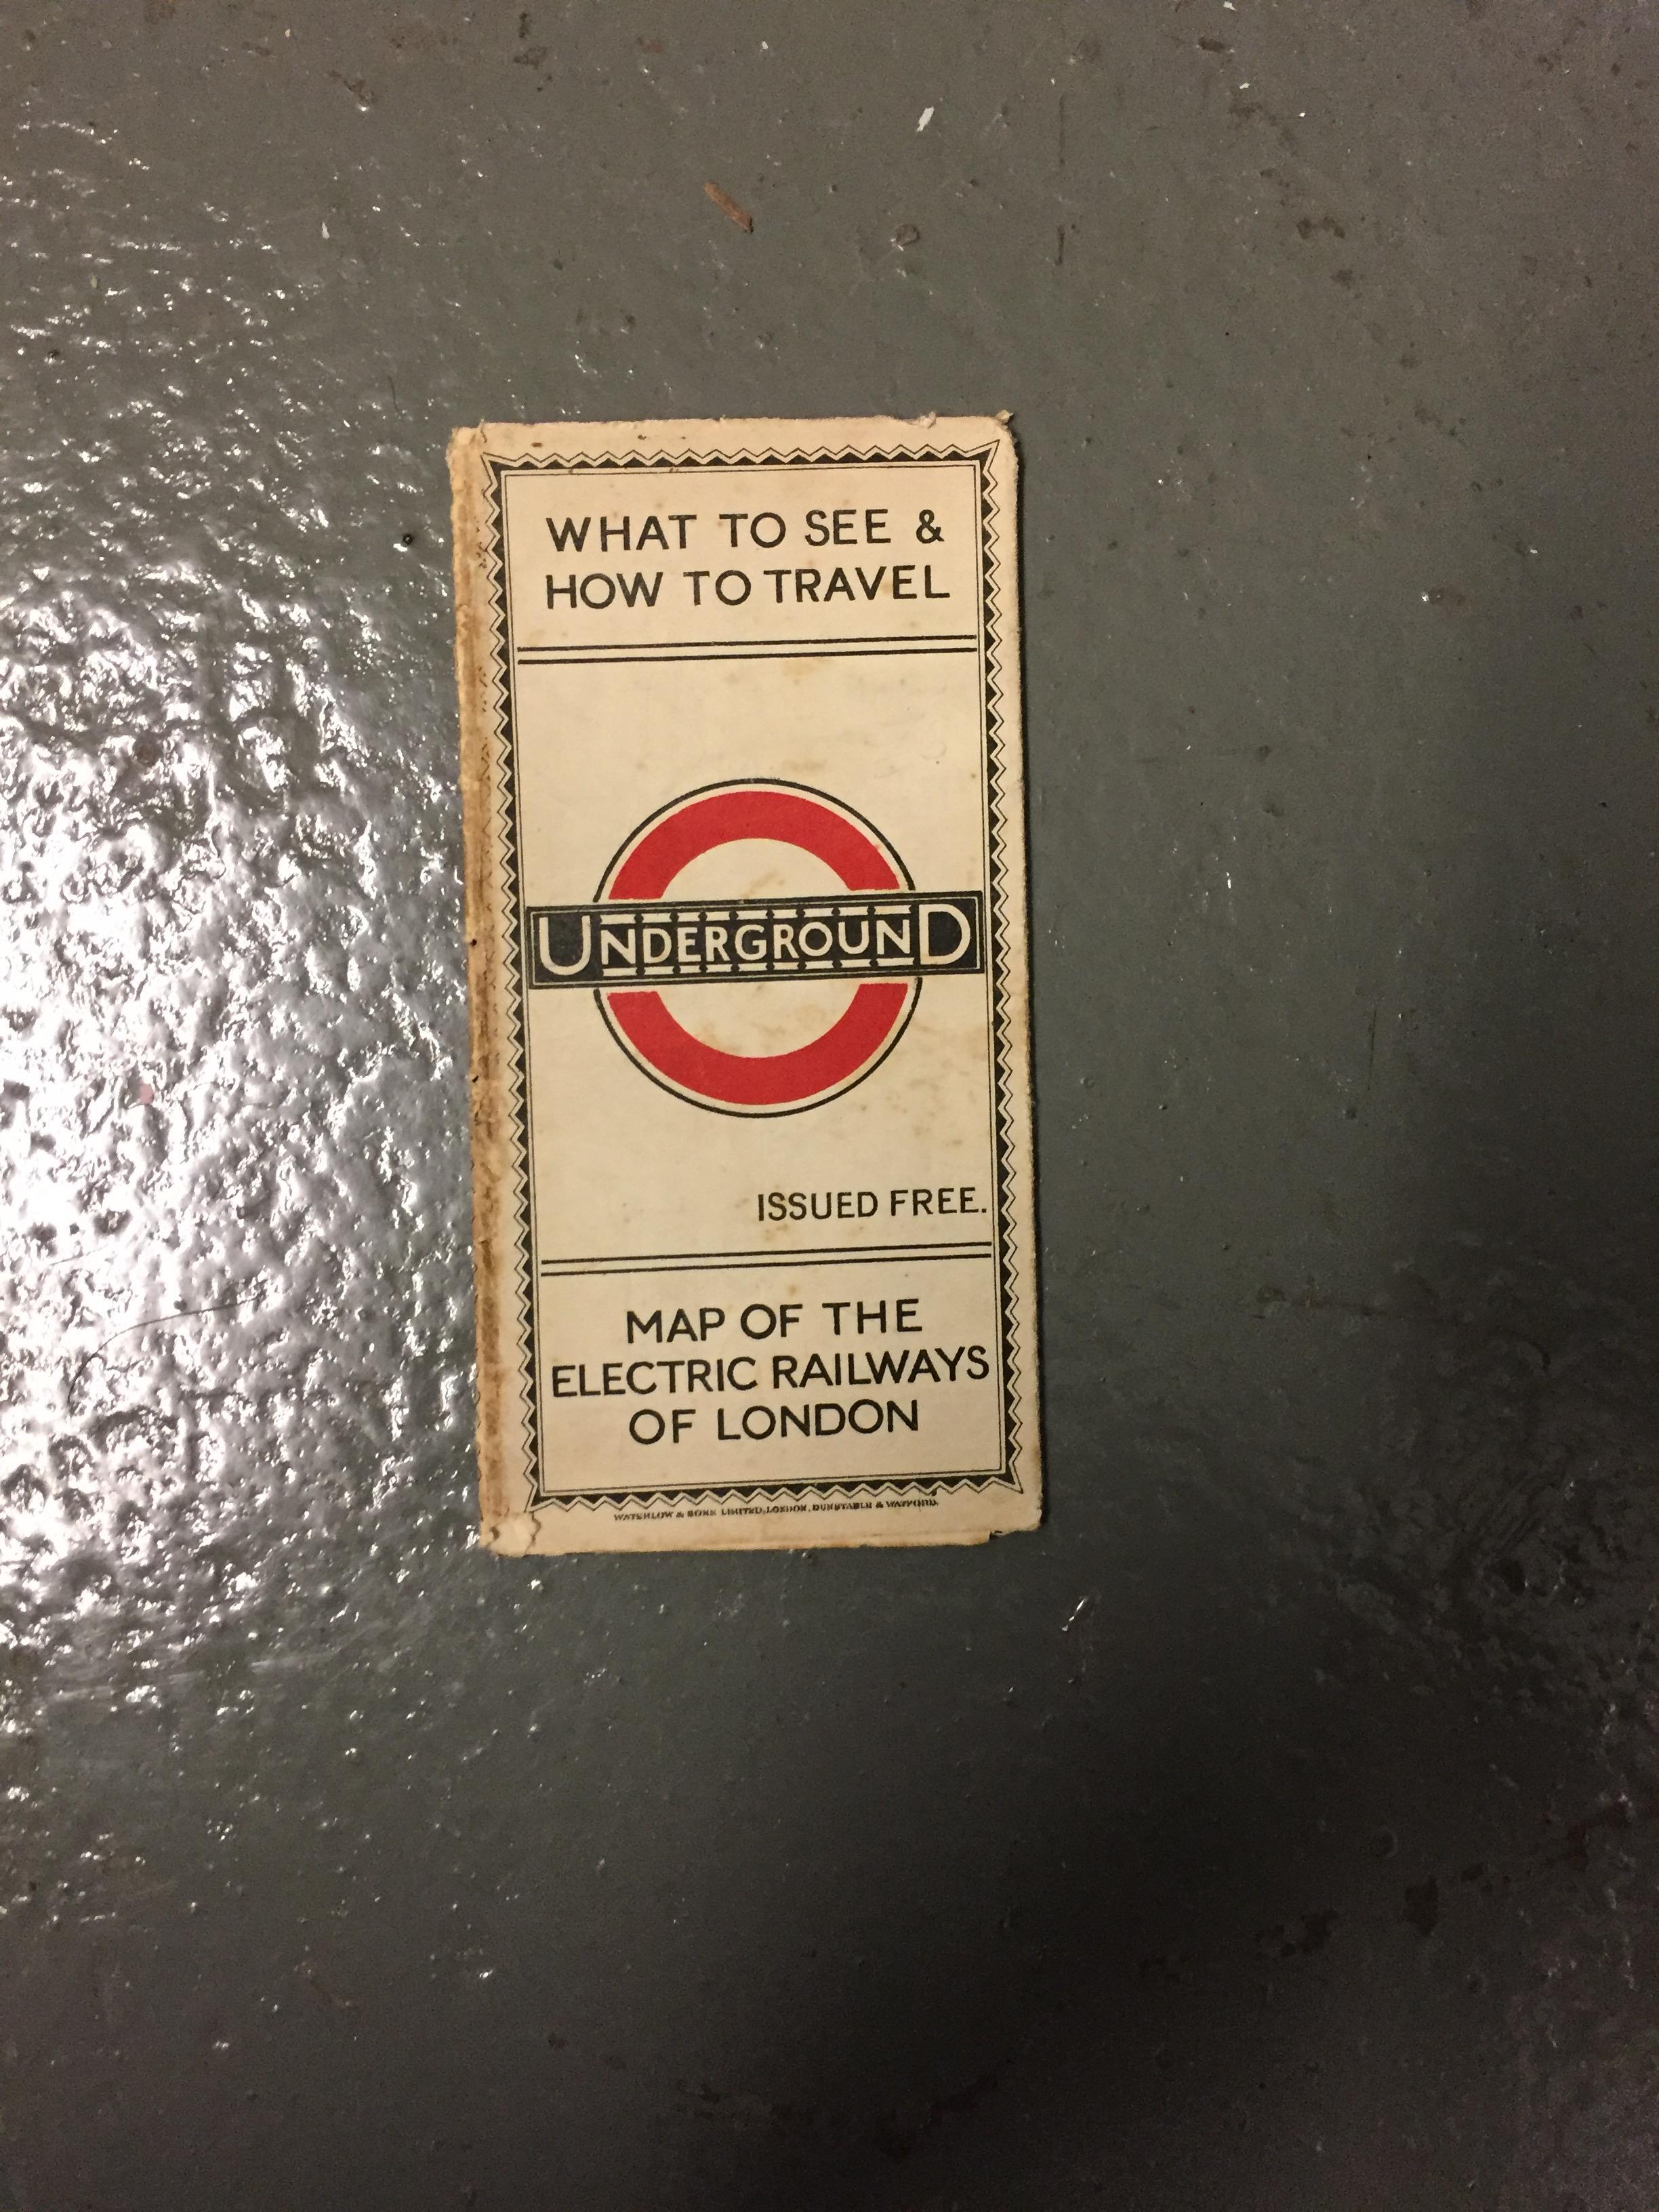 Nine 1910/20s folding pocket maps for London transport,comprising a 1916 General Omnibus Map of some - Image 12 of 15